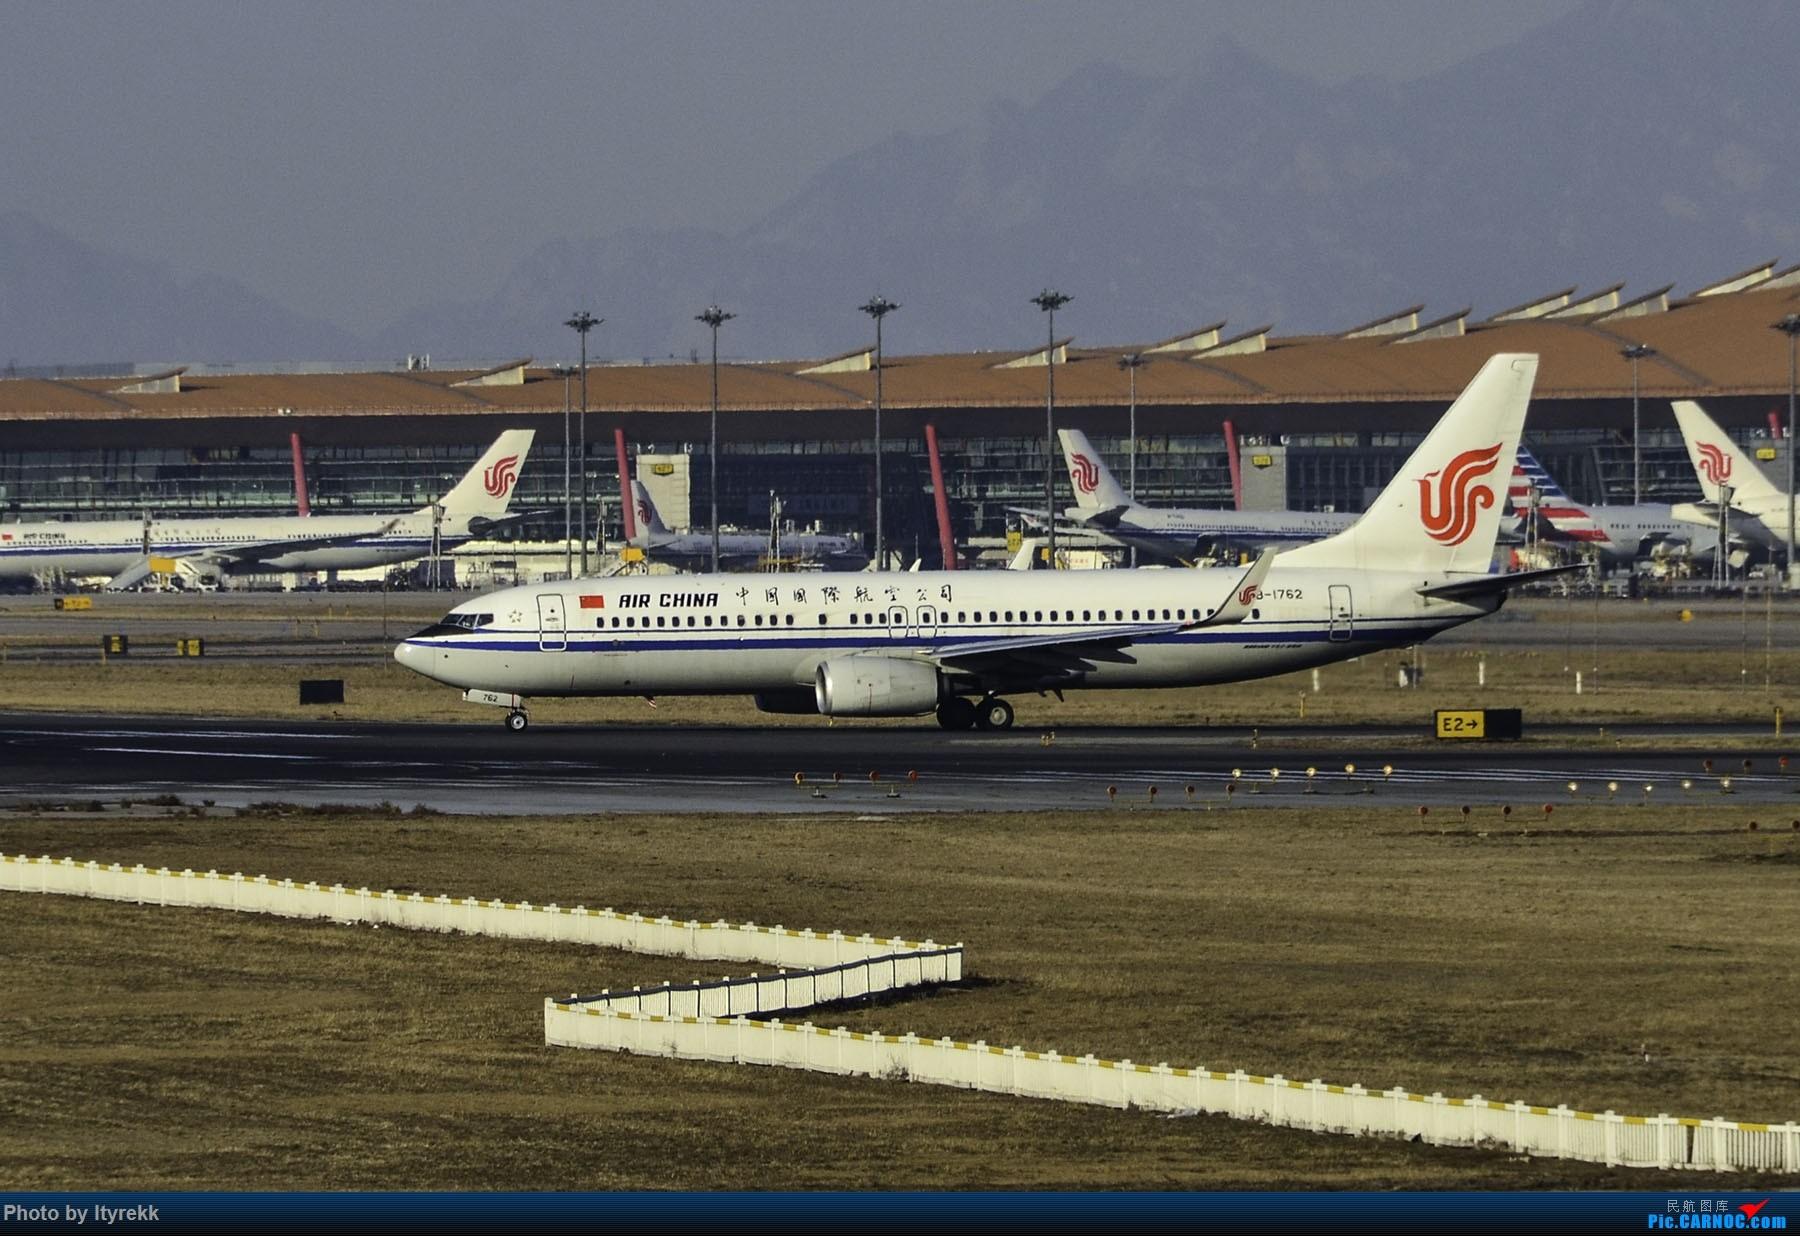 Re:[原创]PEK一日游 收获厦航首架789 B-1566等 BOEING 737-800 B-1762 中国北京首都国际机场